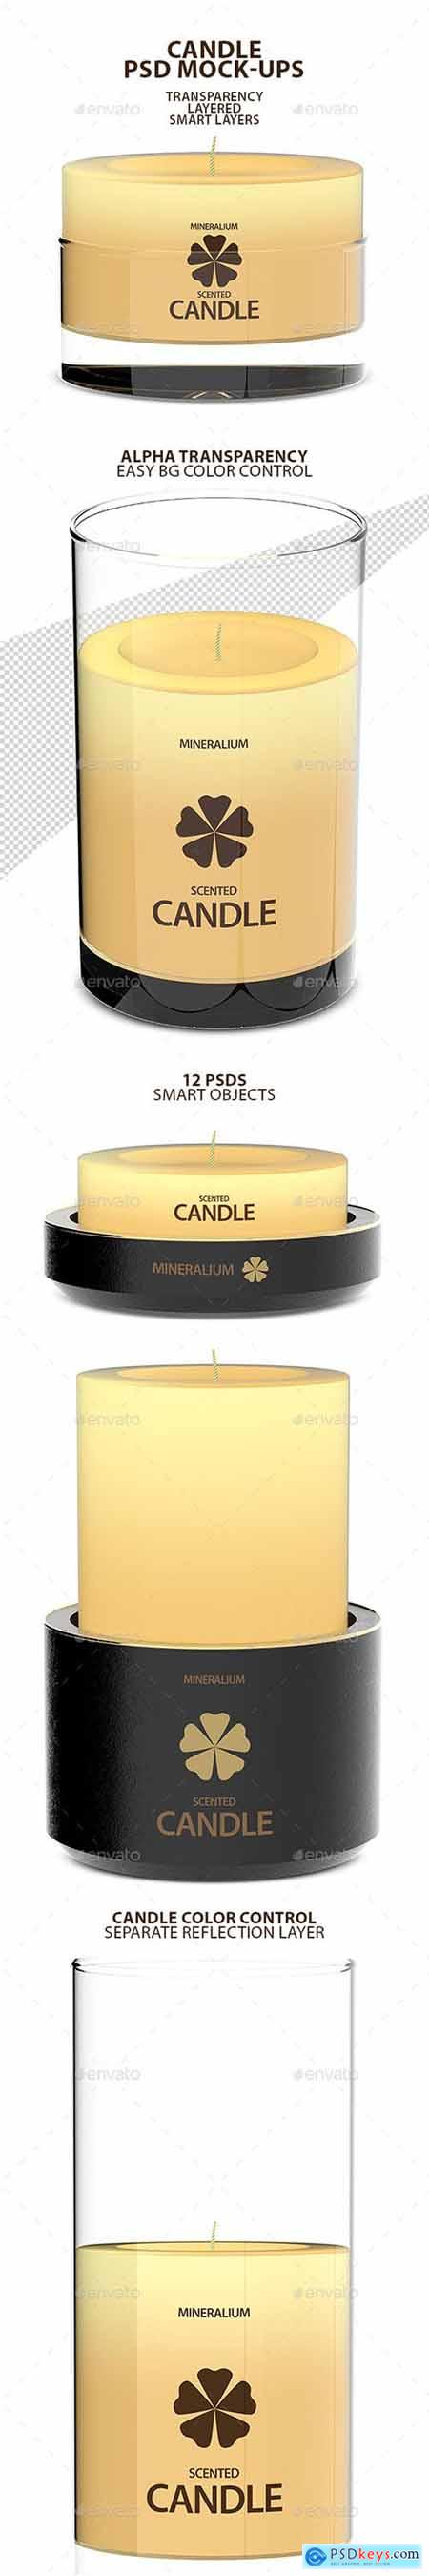 Candle PSD Mock-ups